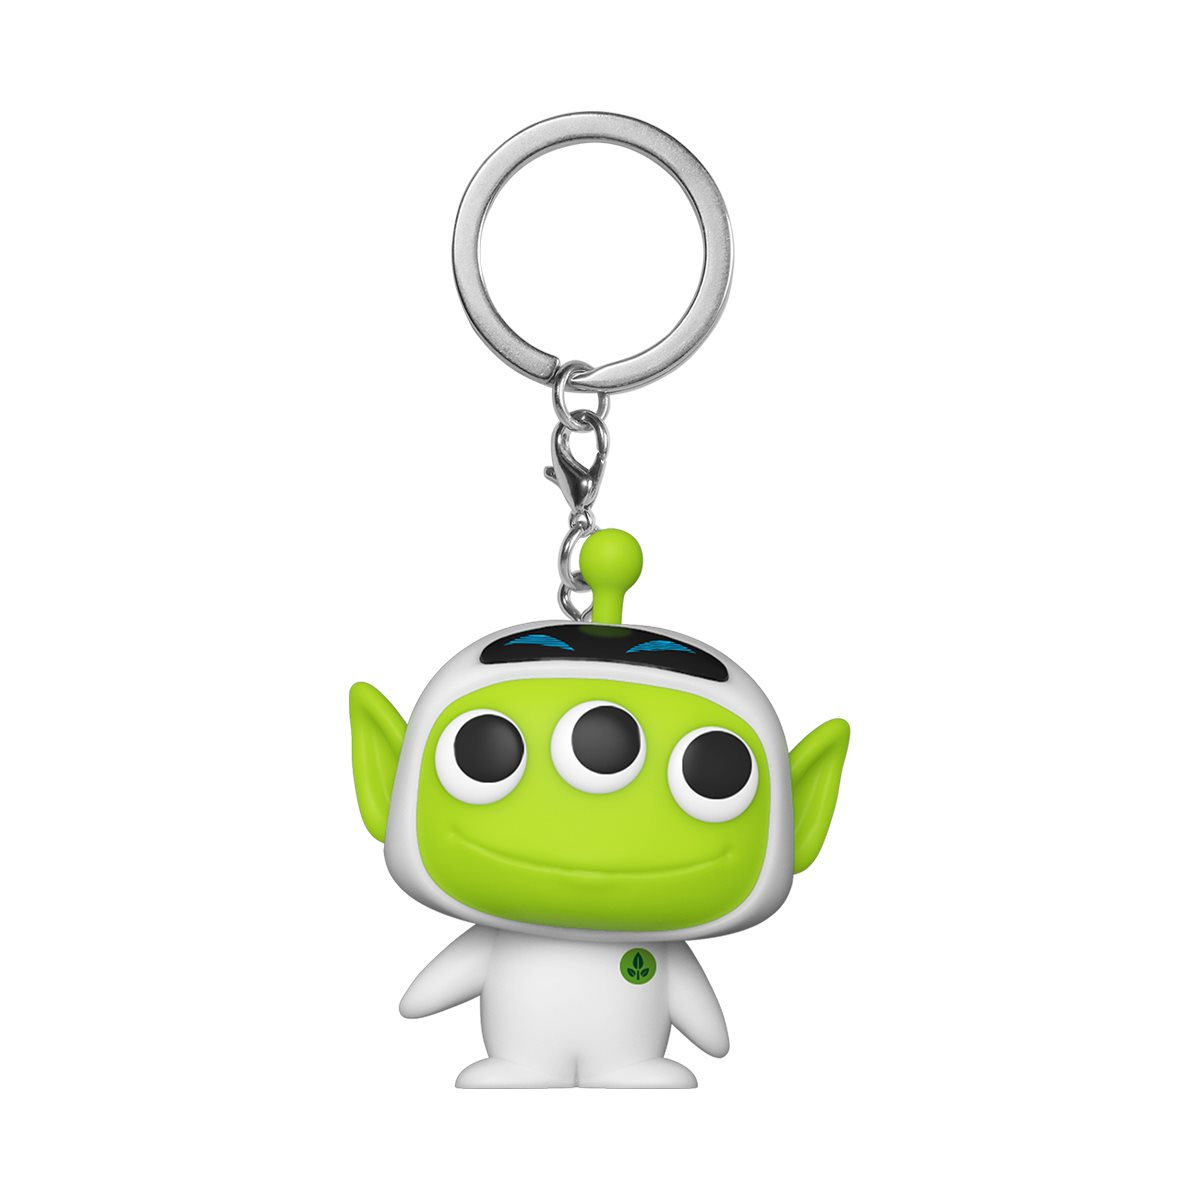 UFO Keychain Sci Fi Keychain Alien Keychain Outer Space IBH Alien Key Ring Keychain  Zipper Pull Extraterrestrial Keychain